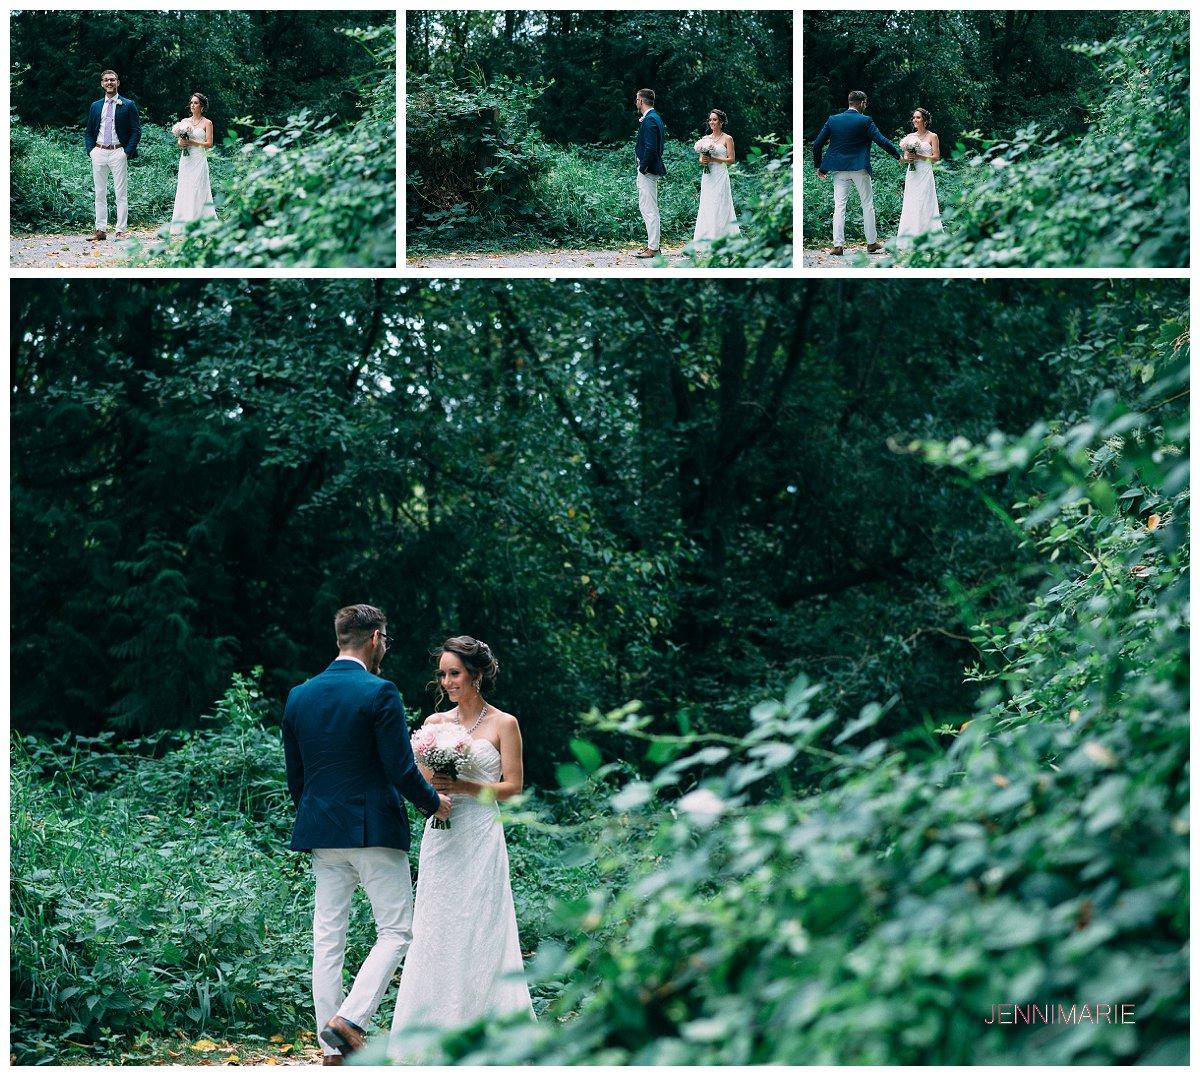 abbotsford_backyard_wedding (8)